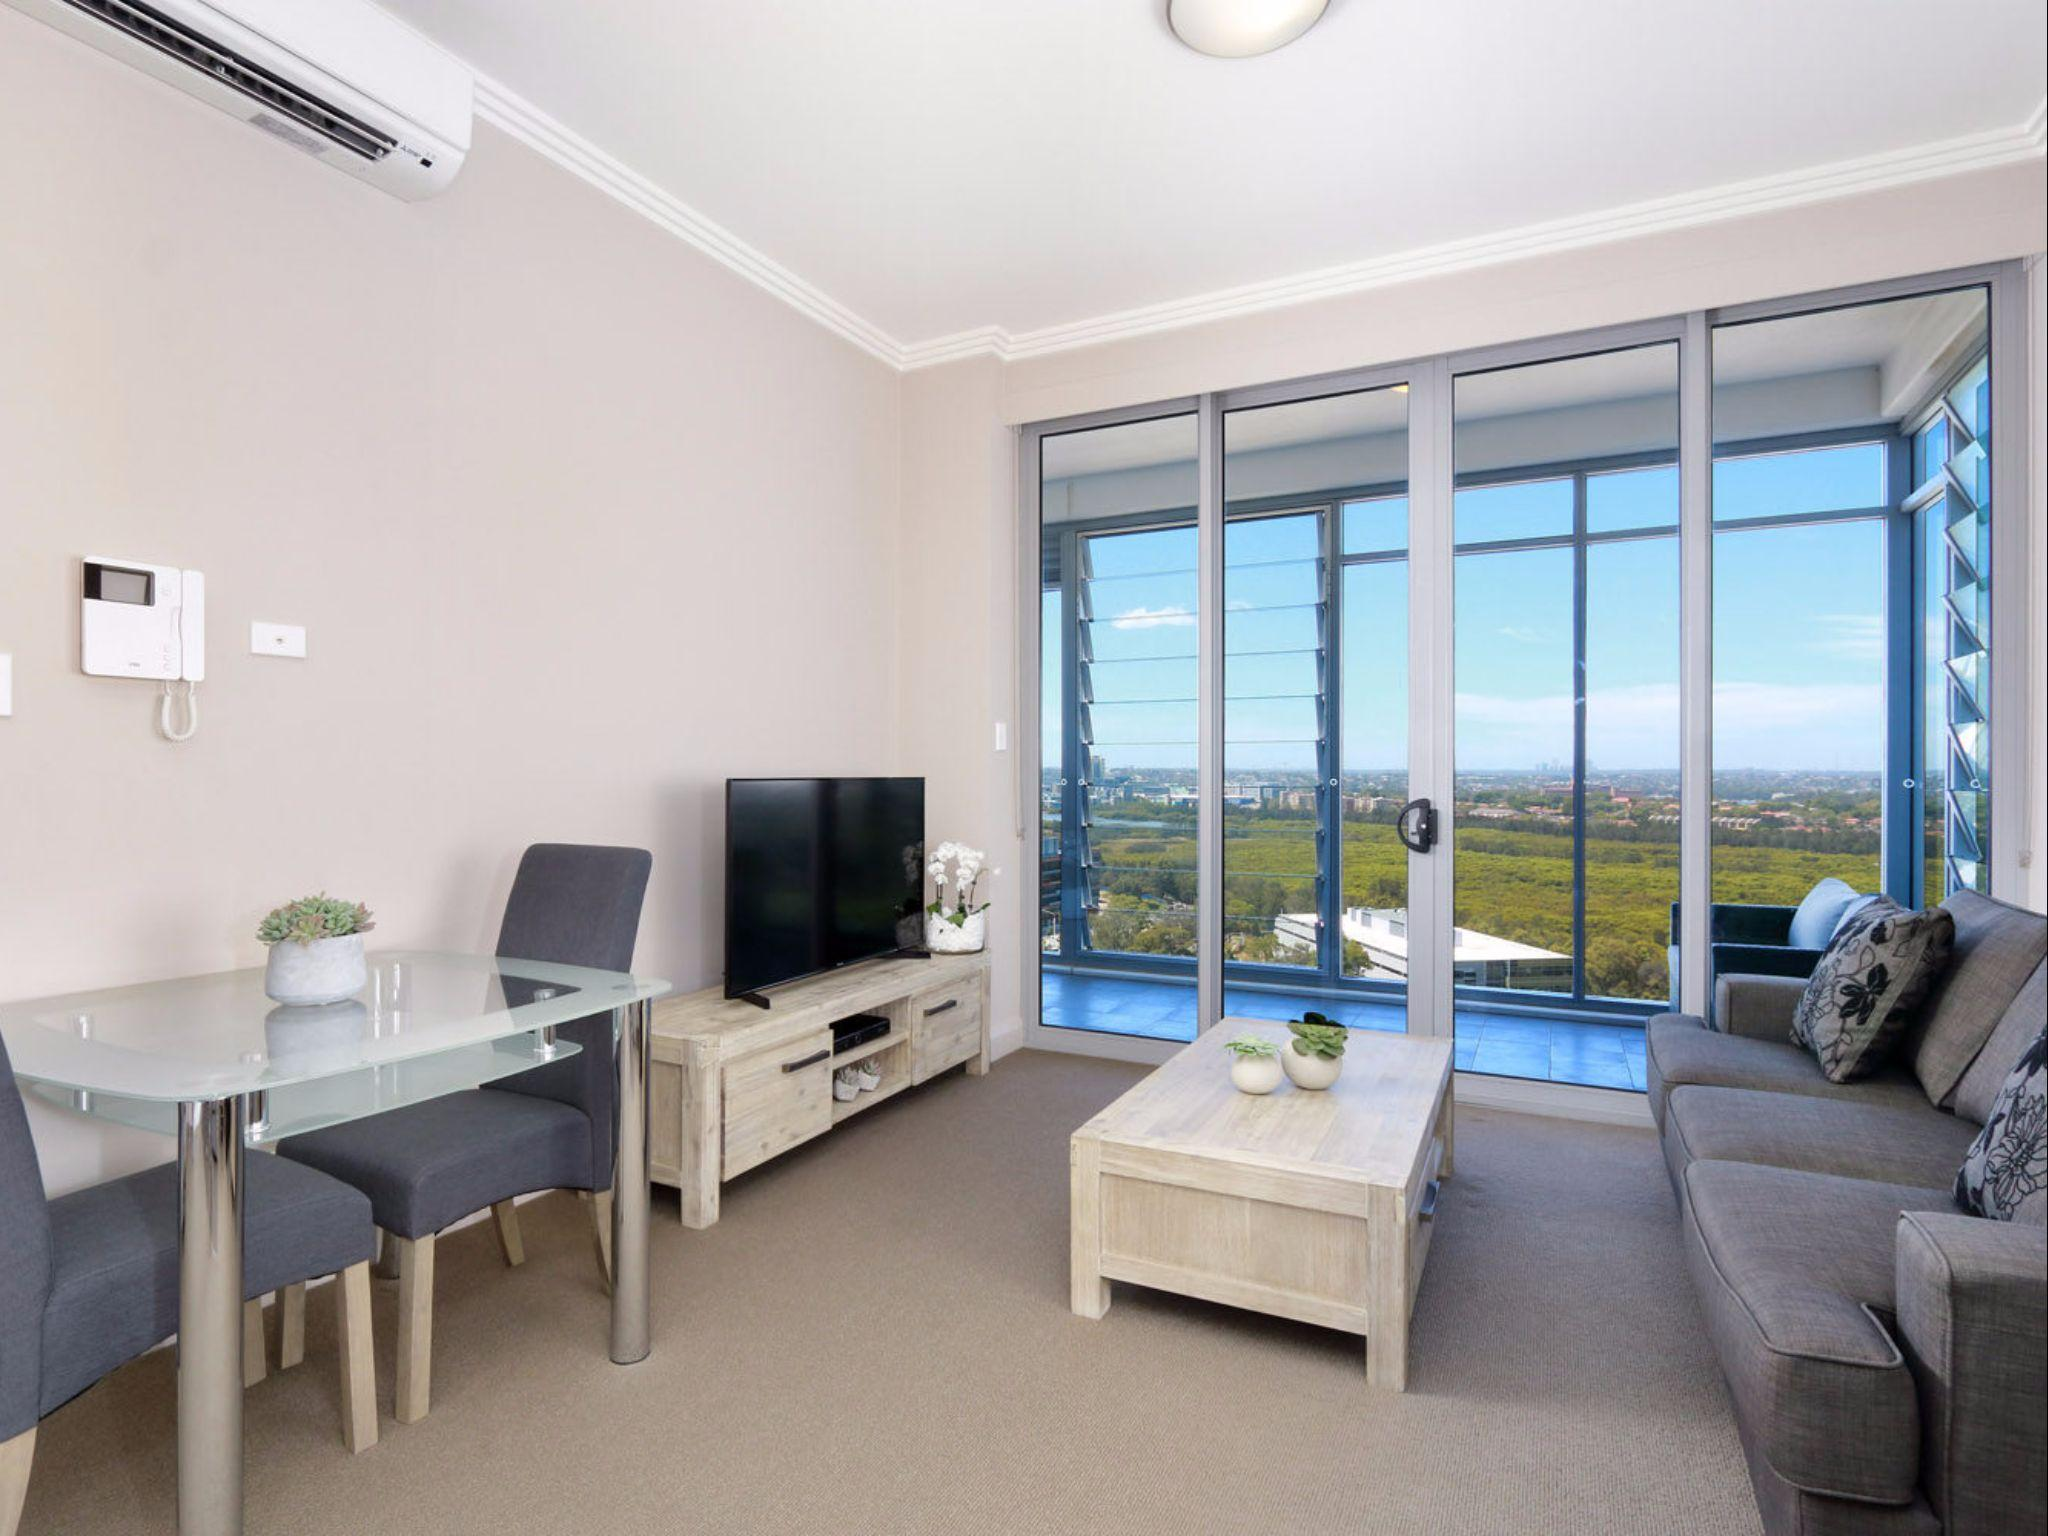 1 Bedroom Spacious Apartment